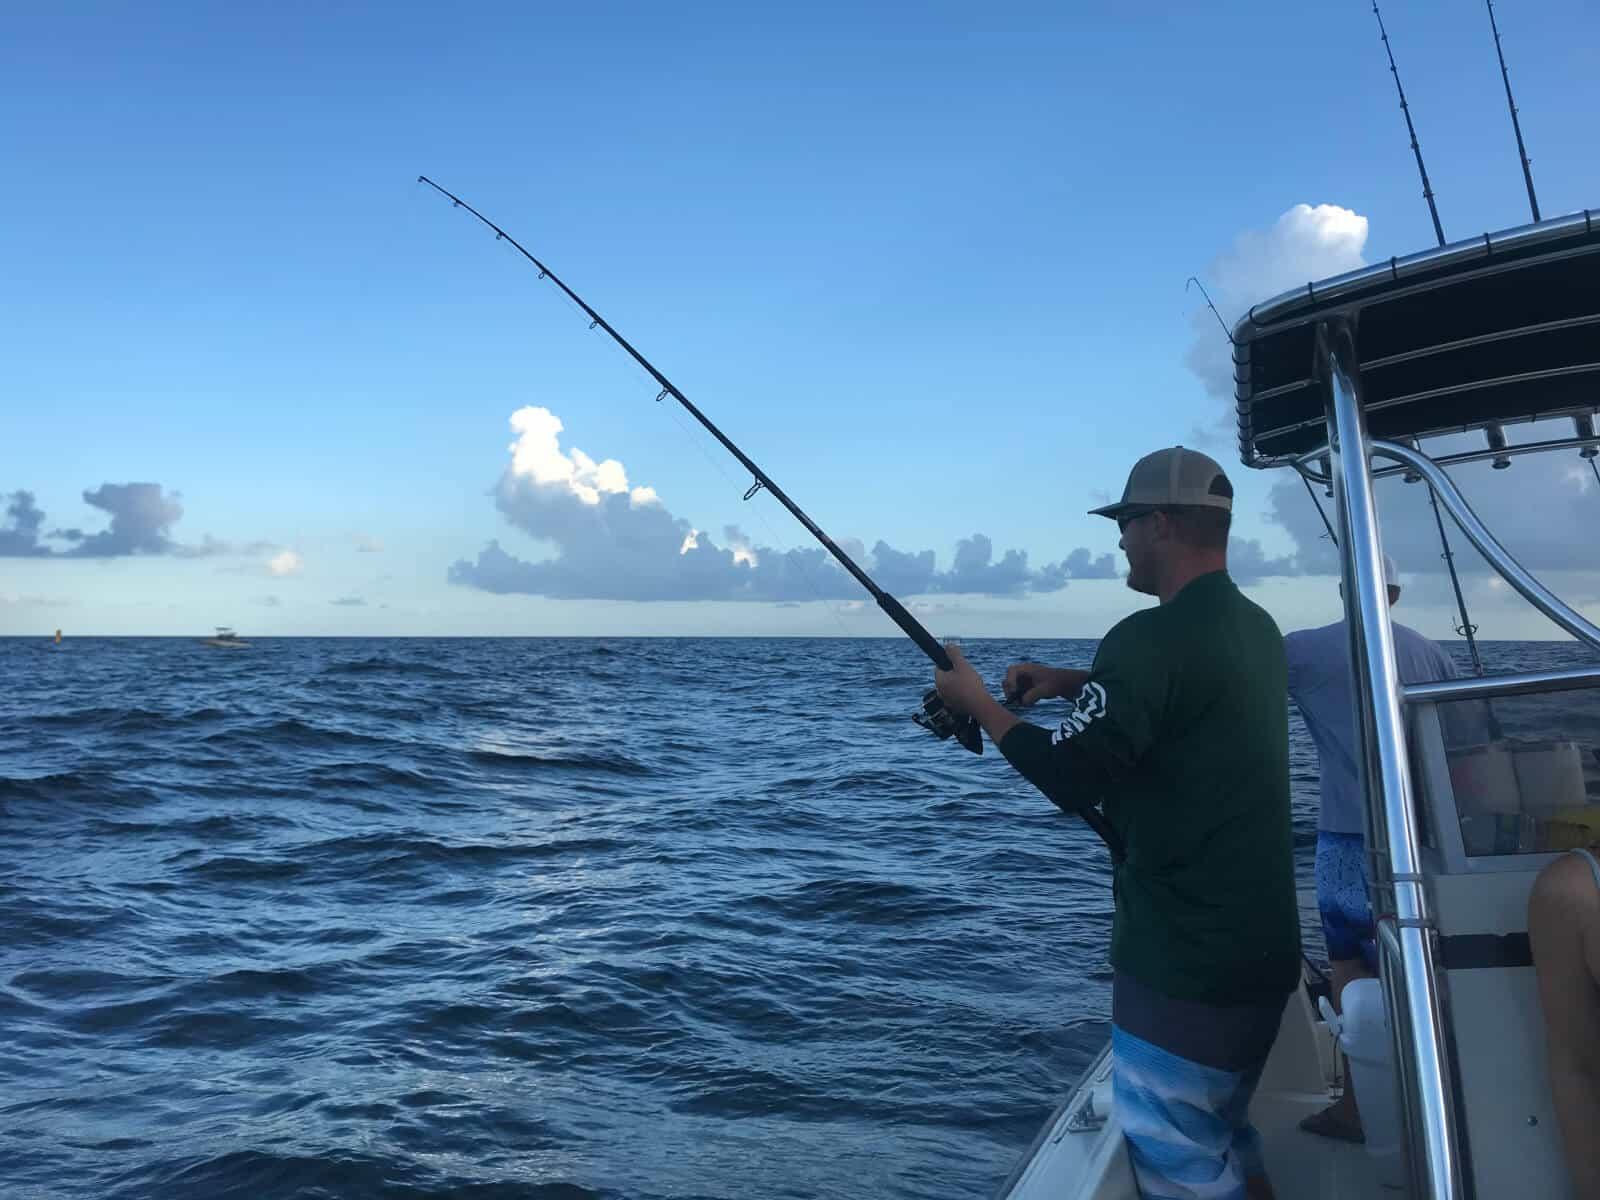 Fishing – Something Fun & Safe to Do During the Pandemic